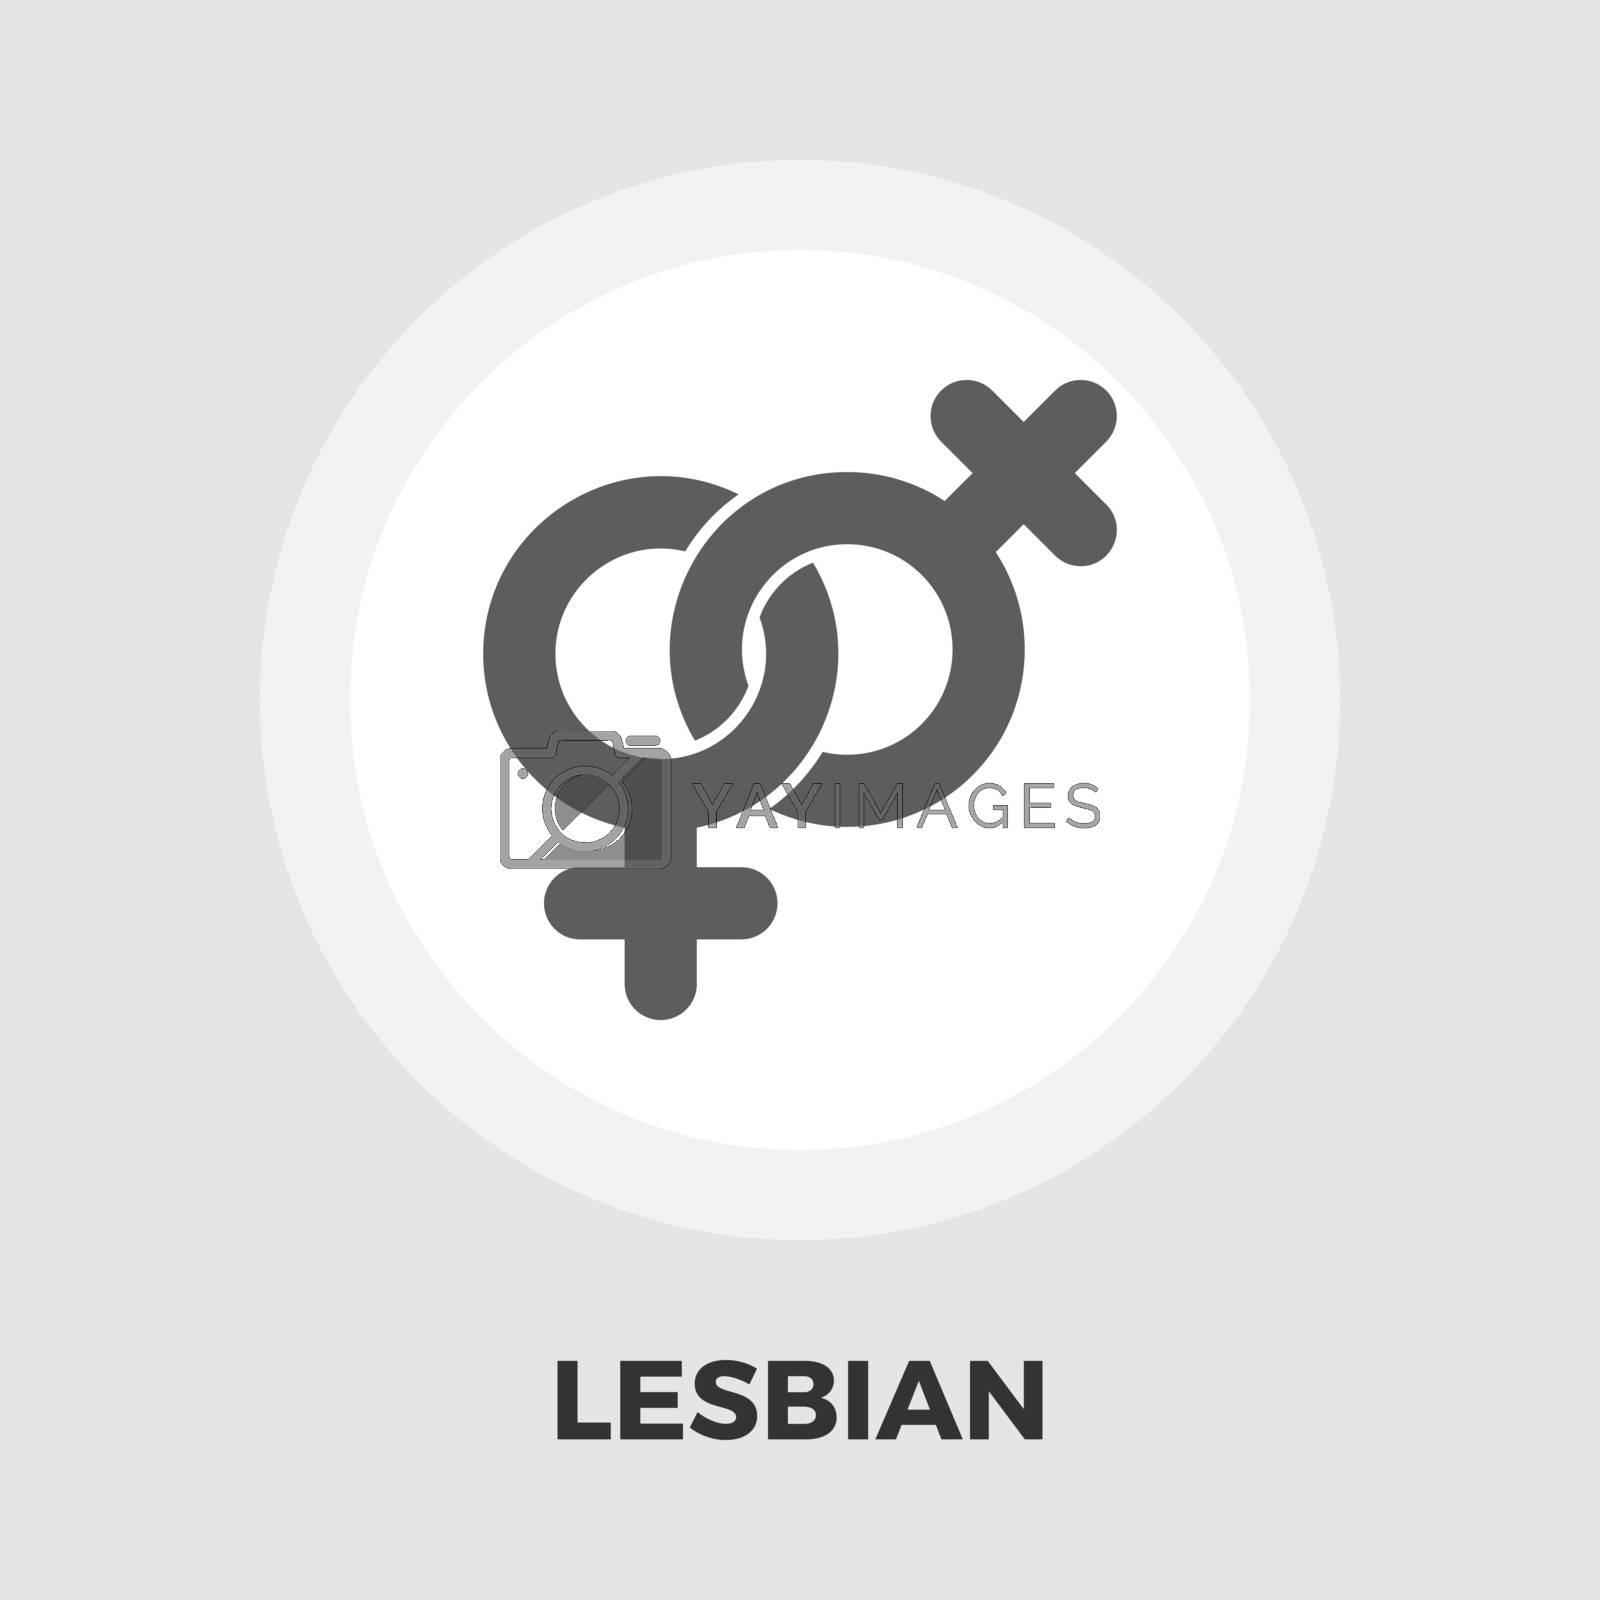 Lesbian sign flat icon by smoki